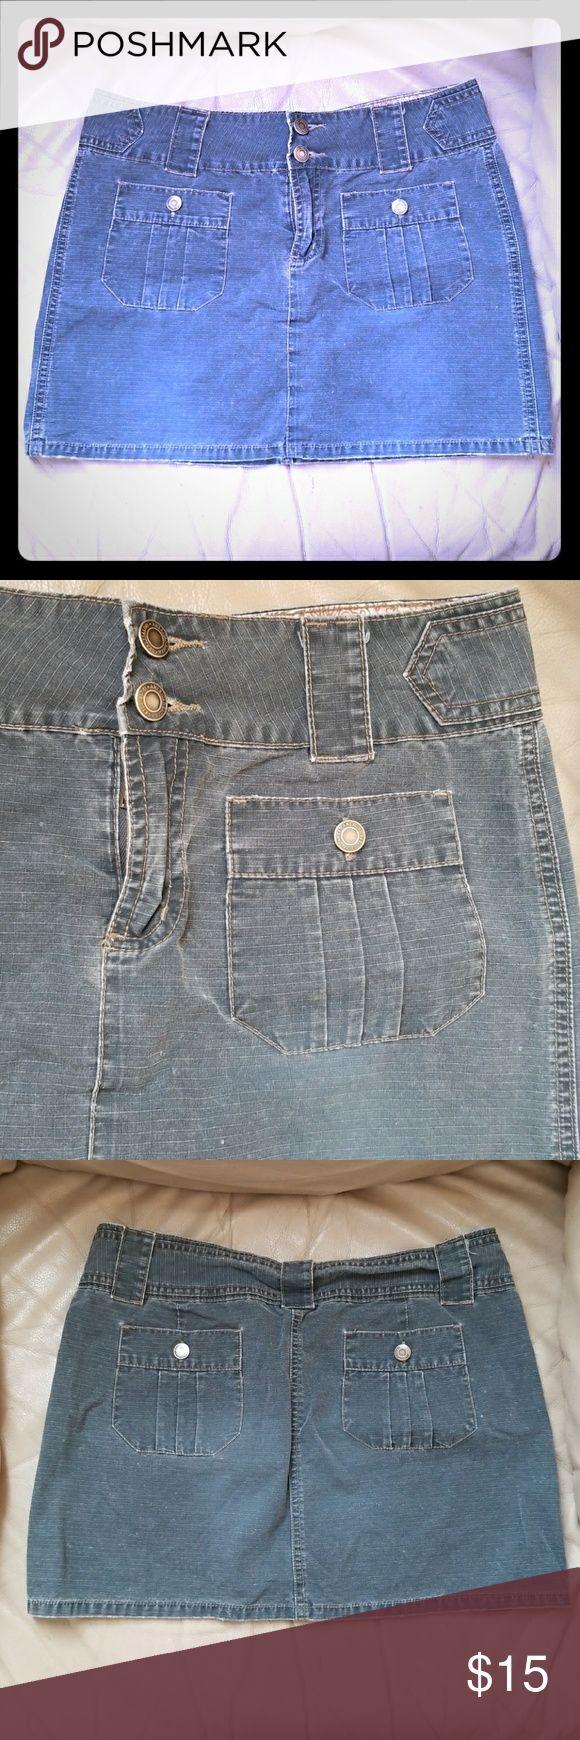 Cute American Eagle jean type skirt Hello! 100% cotton. Enjoy! American Eagle Outfitters Skirts Mini